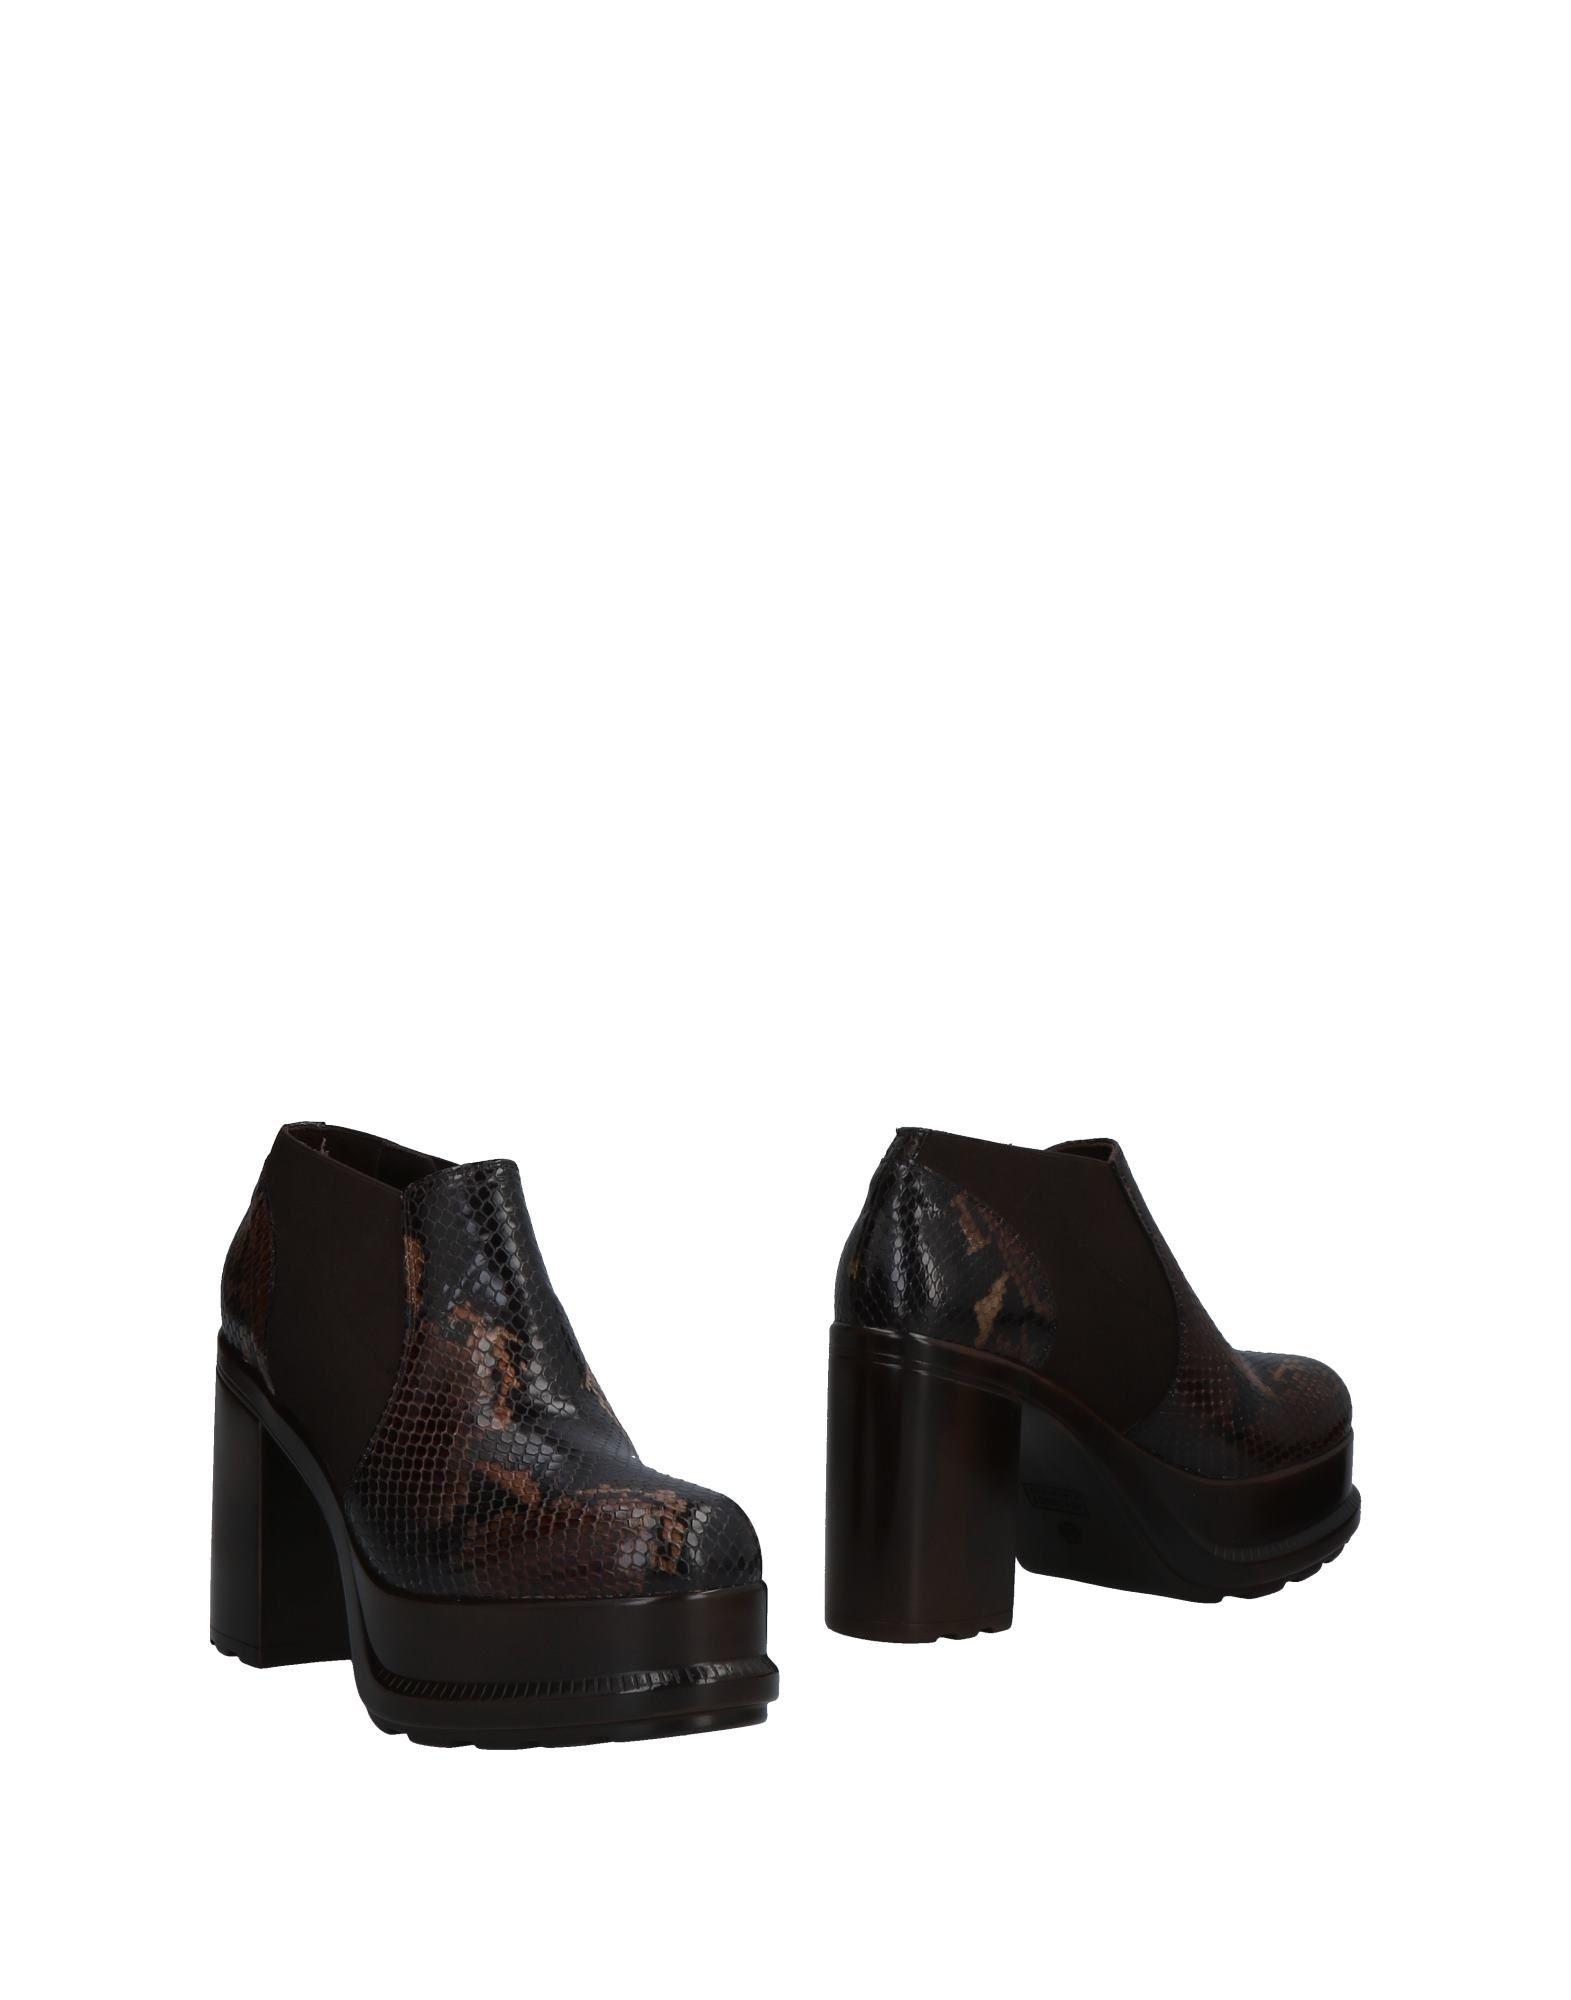 Jeannot Stiefelette Damen  11491717PD Gute Qualität beliebte Schuhe